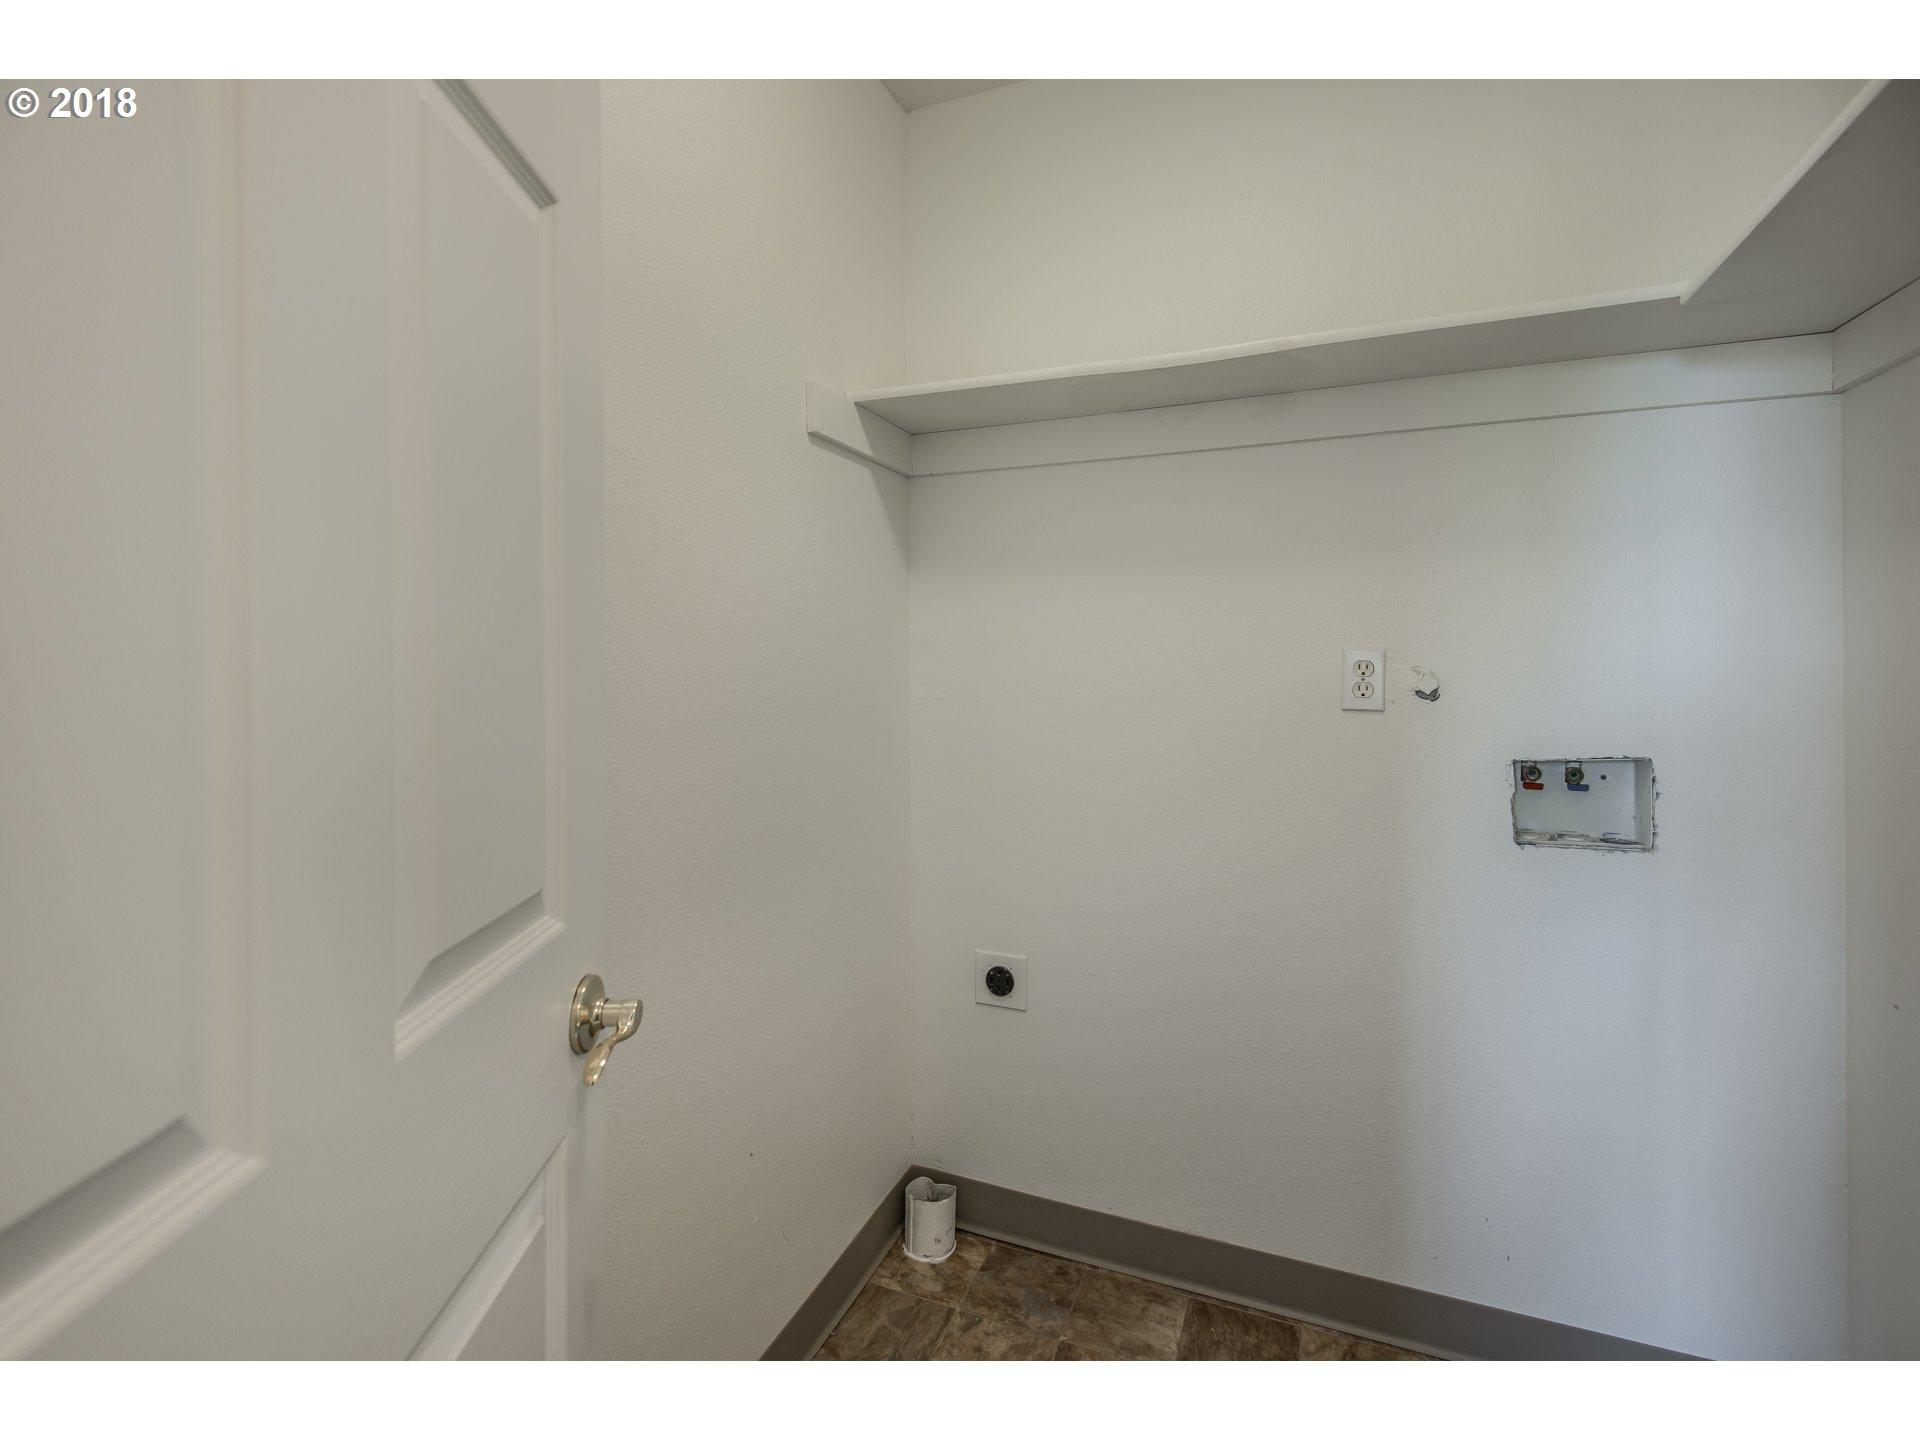 12130 NE FREMONT ST Portland, OR 97220 - MLS #: 18695743